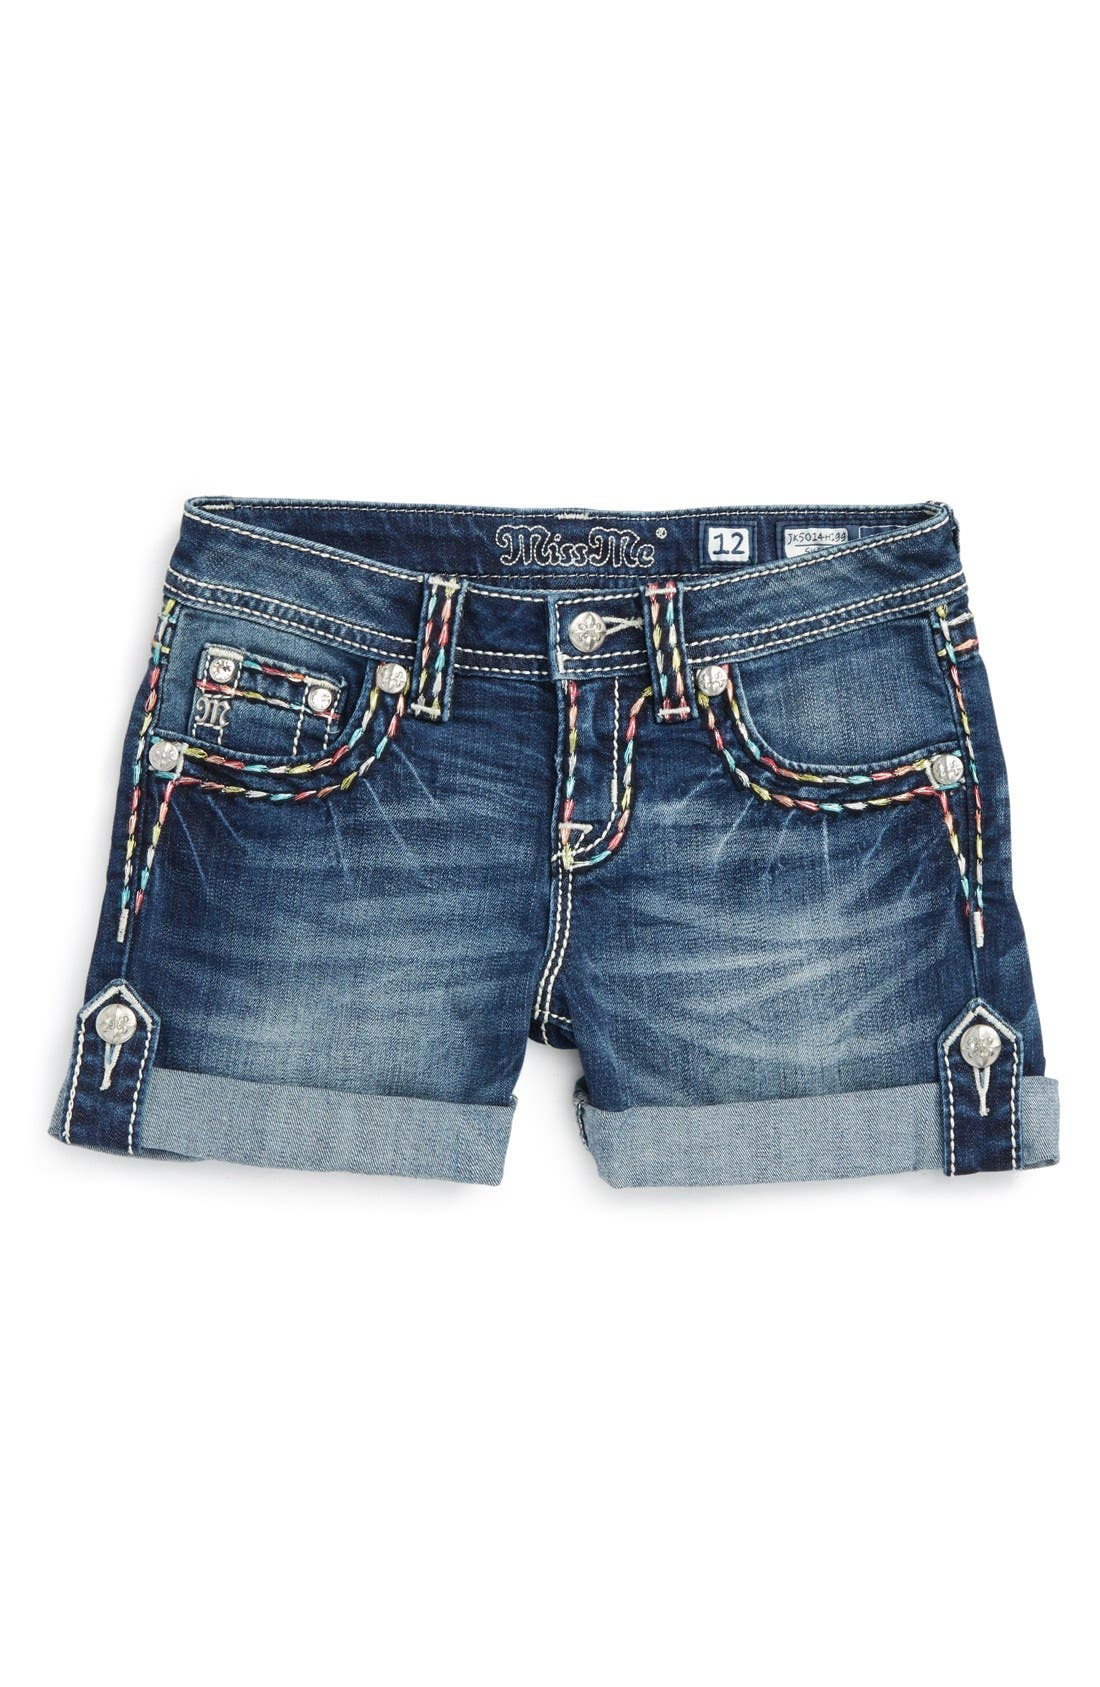 Alternate Image 1 Selected - Miss Me Rainbow Stitch Embellished Cuff Shorts (Big Girls)